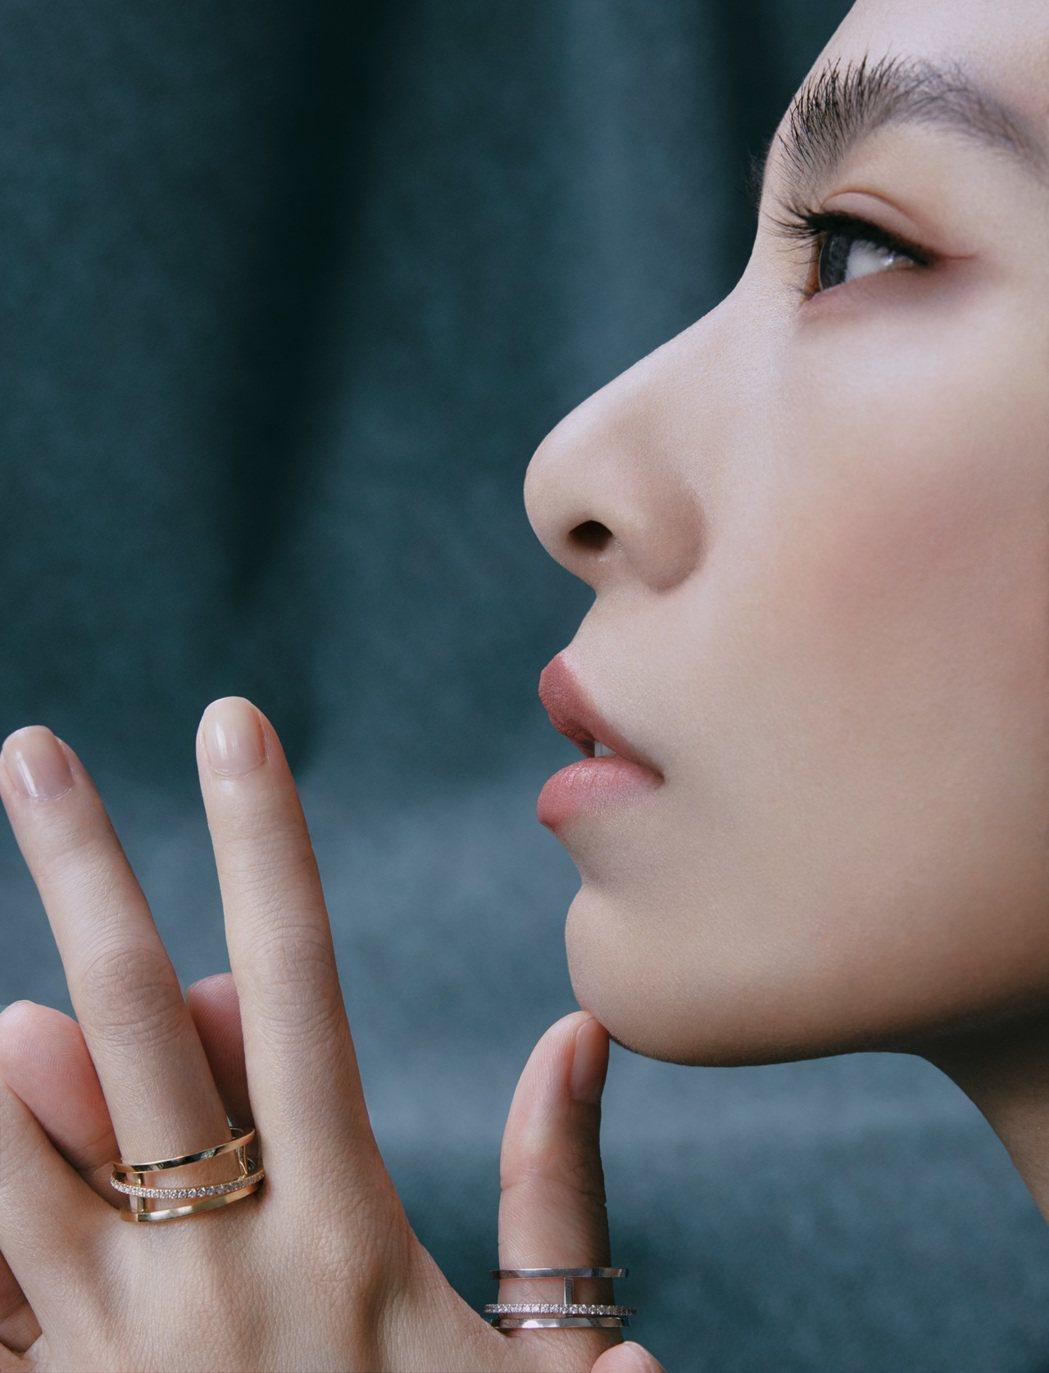 Hebe田馥甄即將推出新專輯,與粉絲分享自己的狀態跟心情。圖/Bella儂儂提供